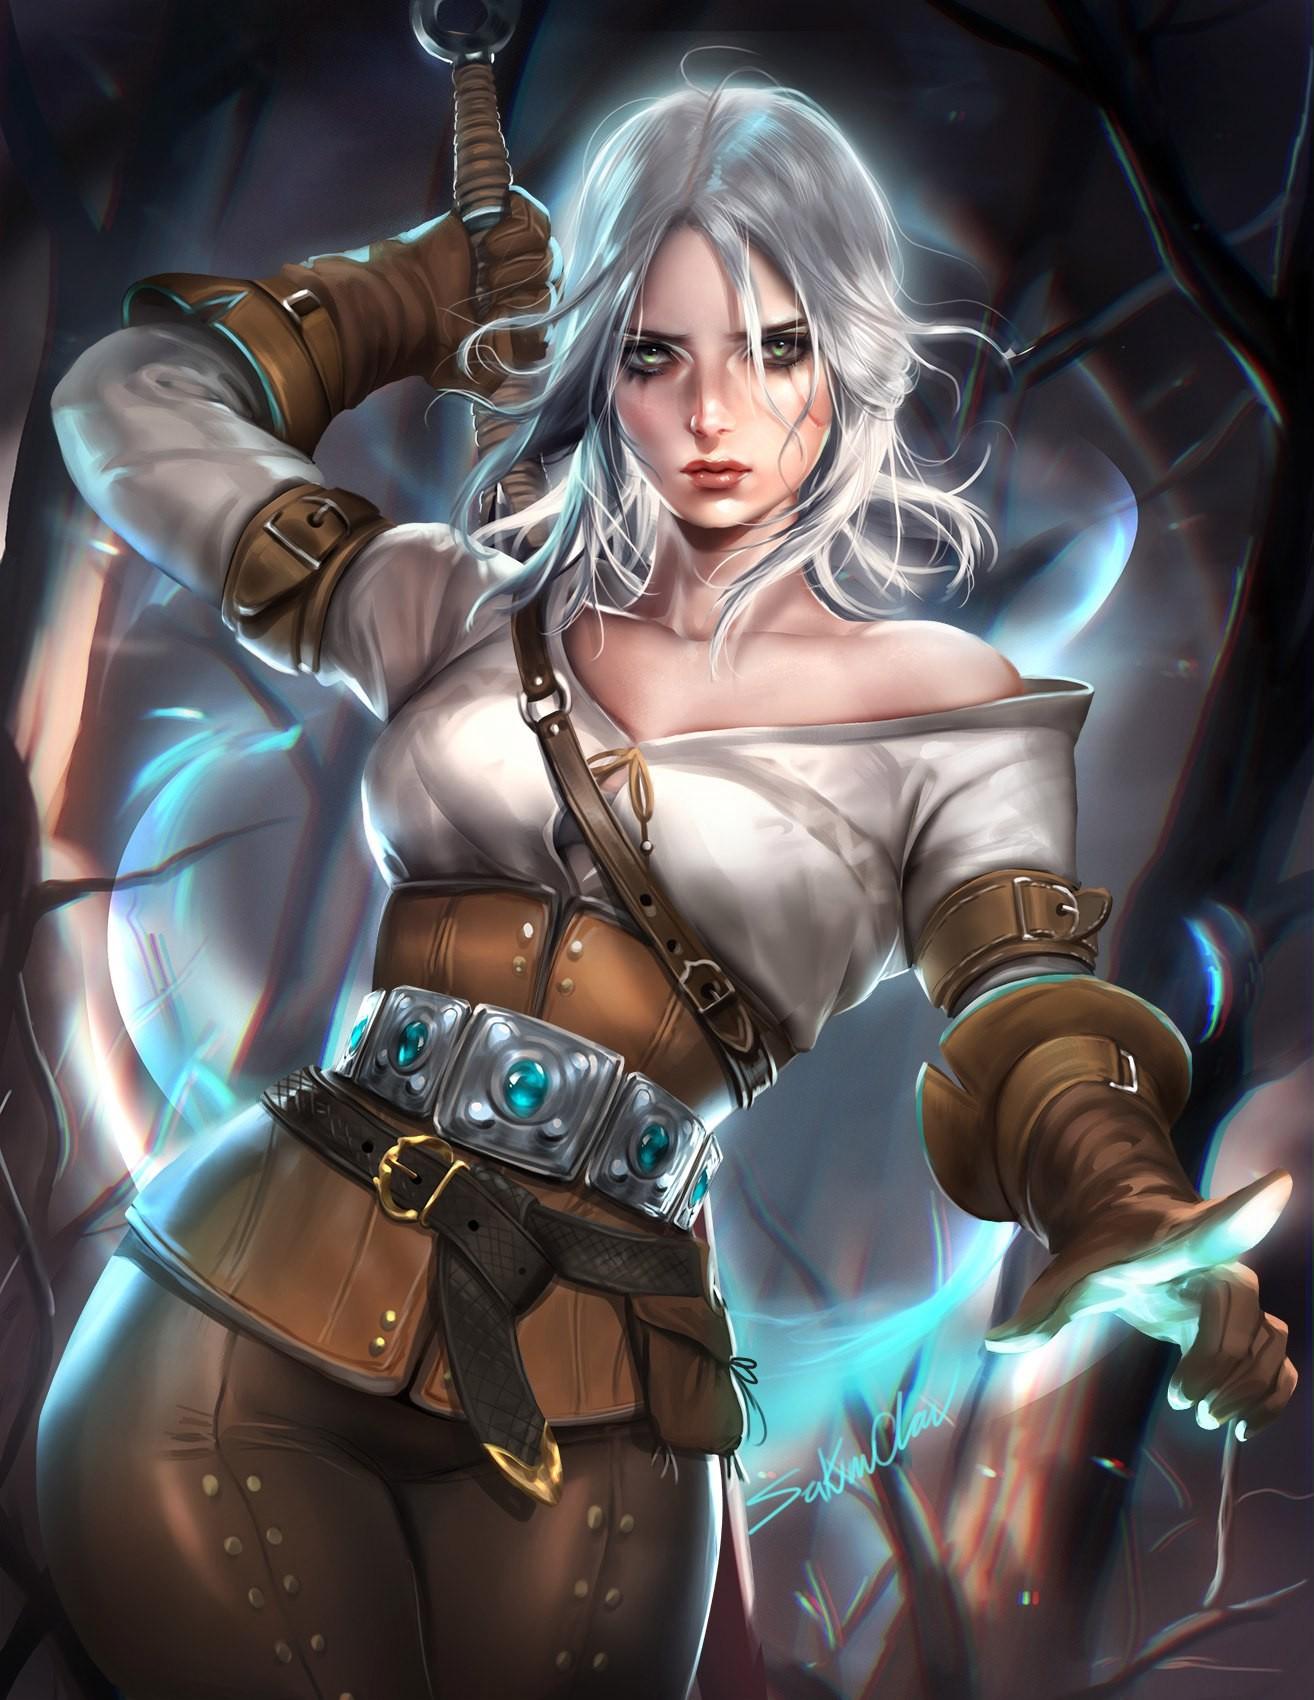 Anime 1314x1700 Sakimichan realistic The Witcher 3: Wild Hunt fantasy girl sword Cirilla Fiona Elen Riannon video games